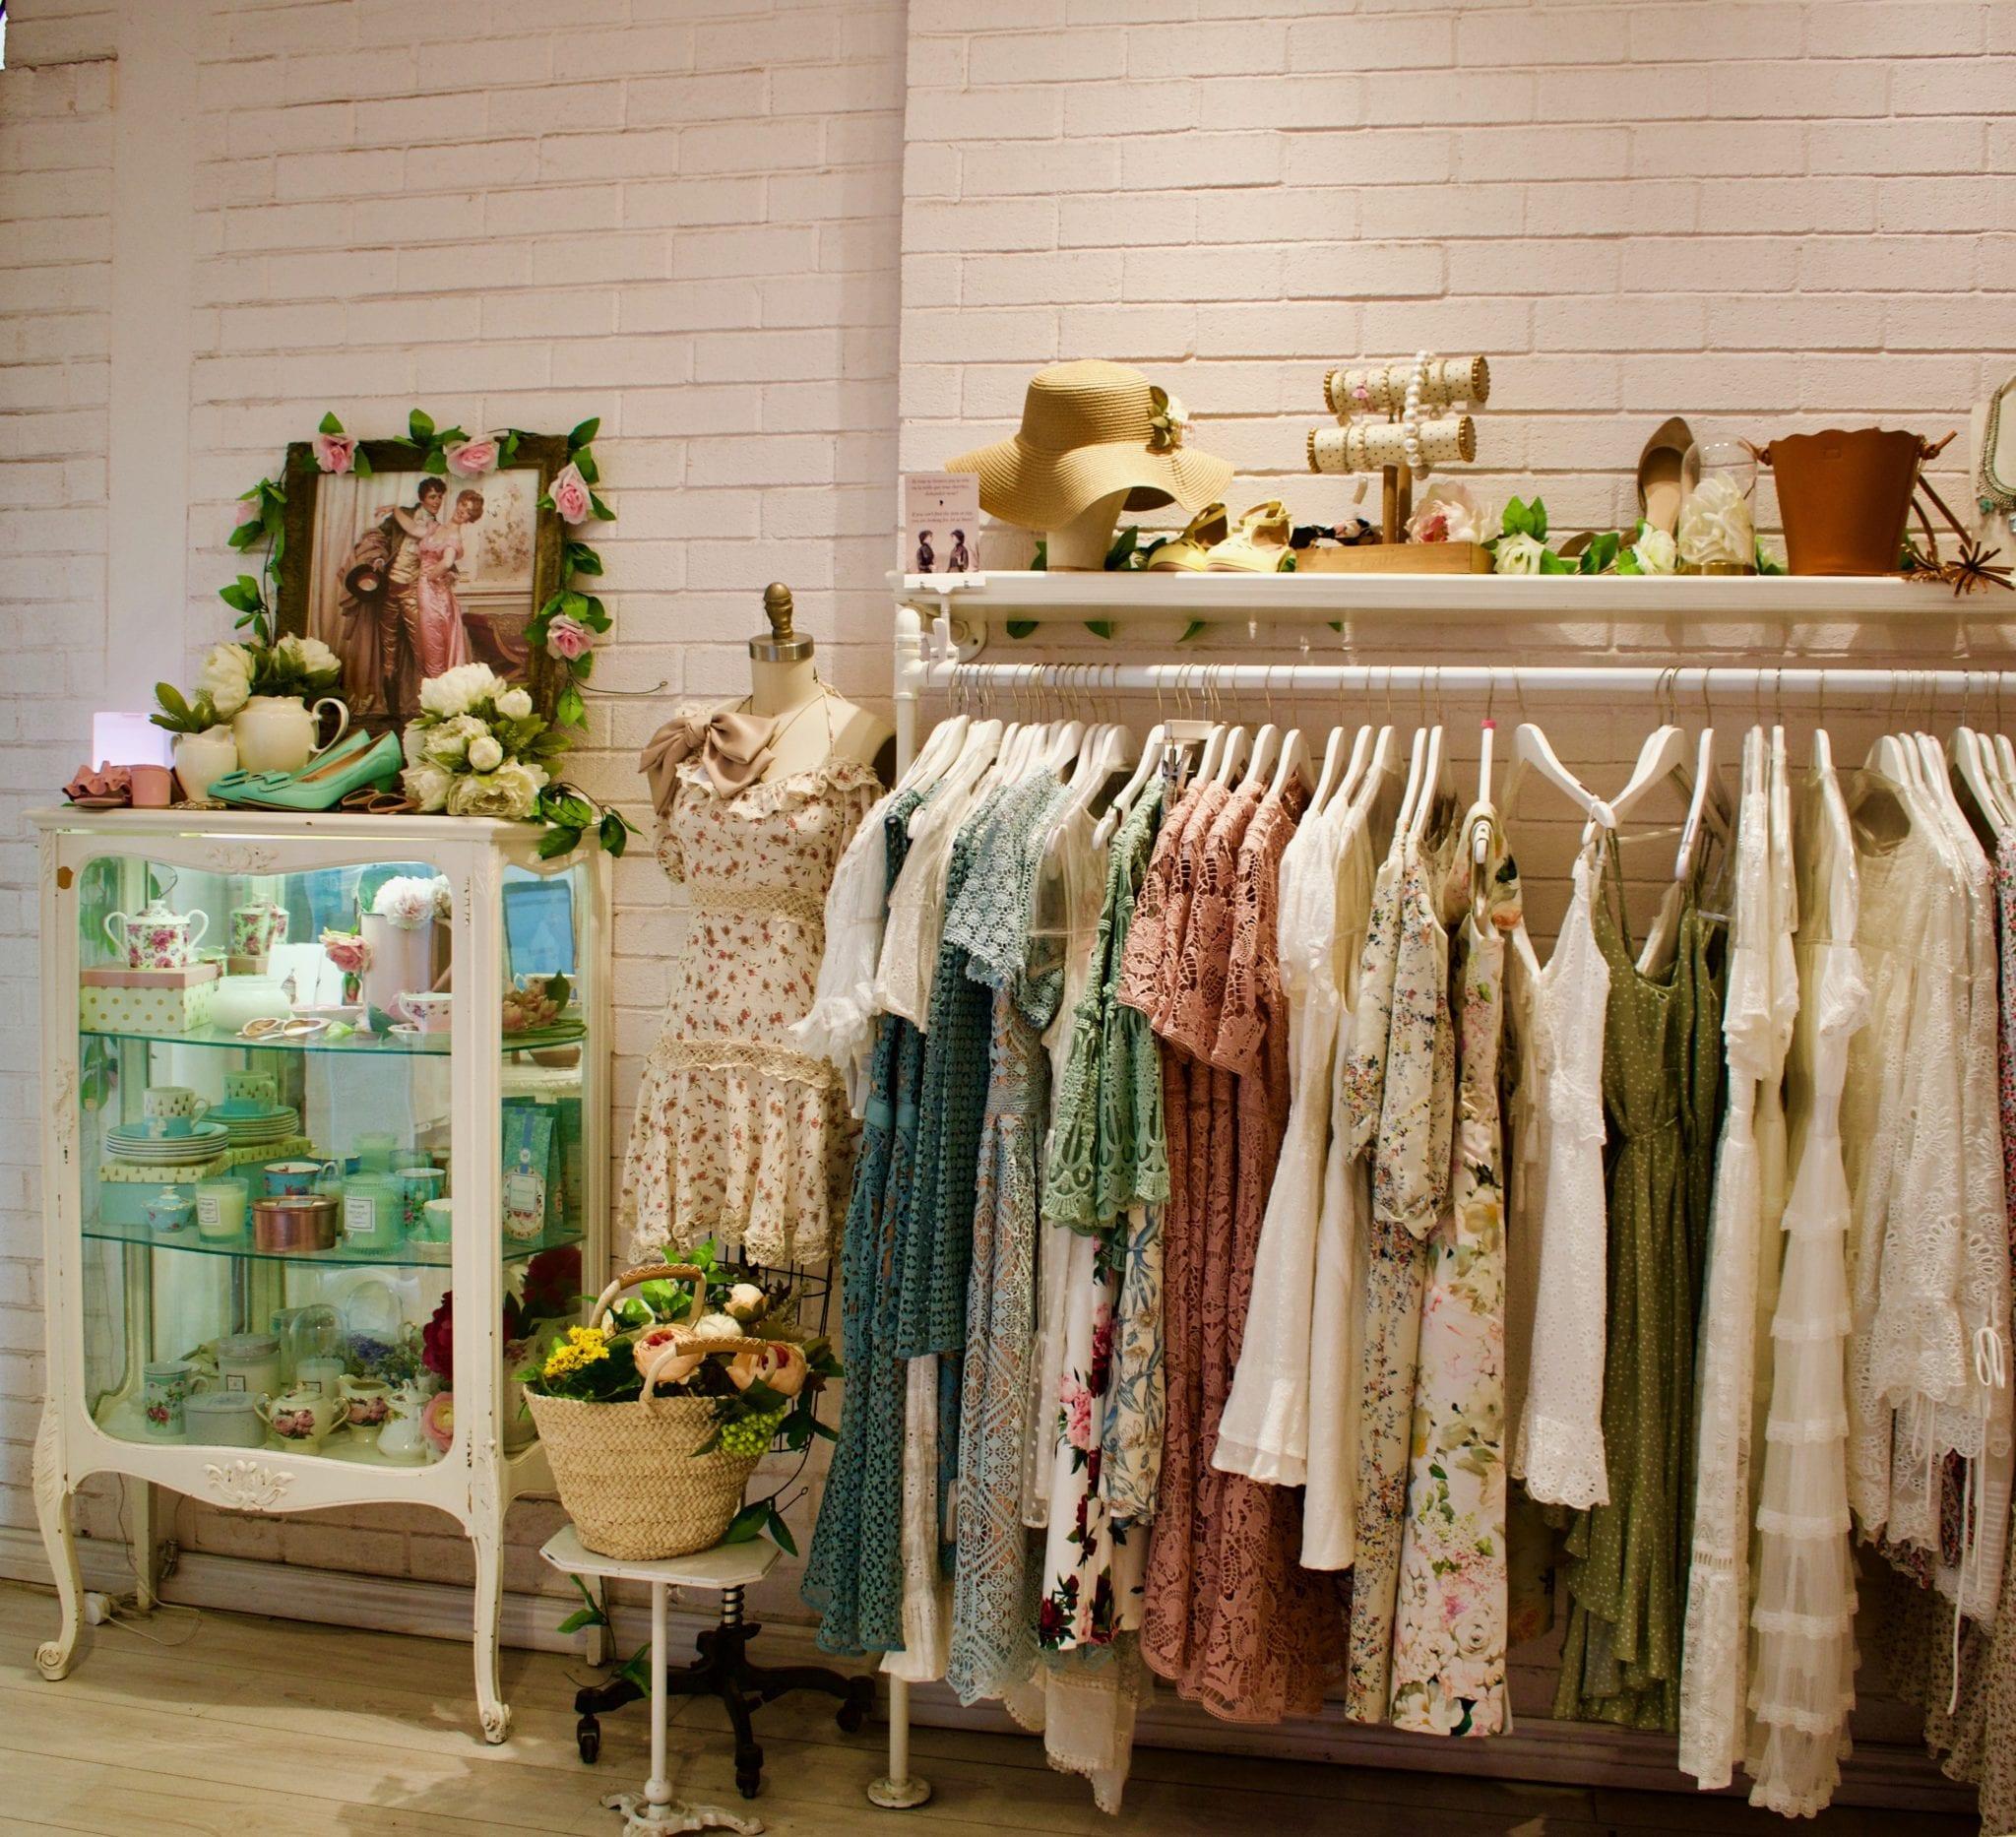 Boutique 1861 | © Photo by Chelsie Evans